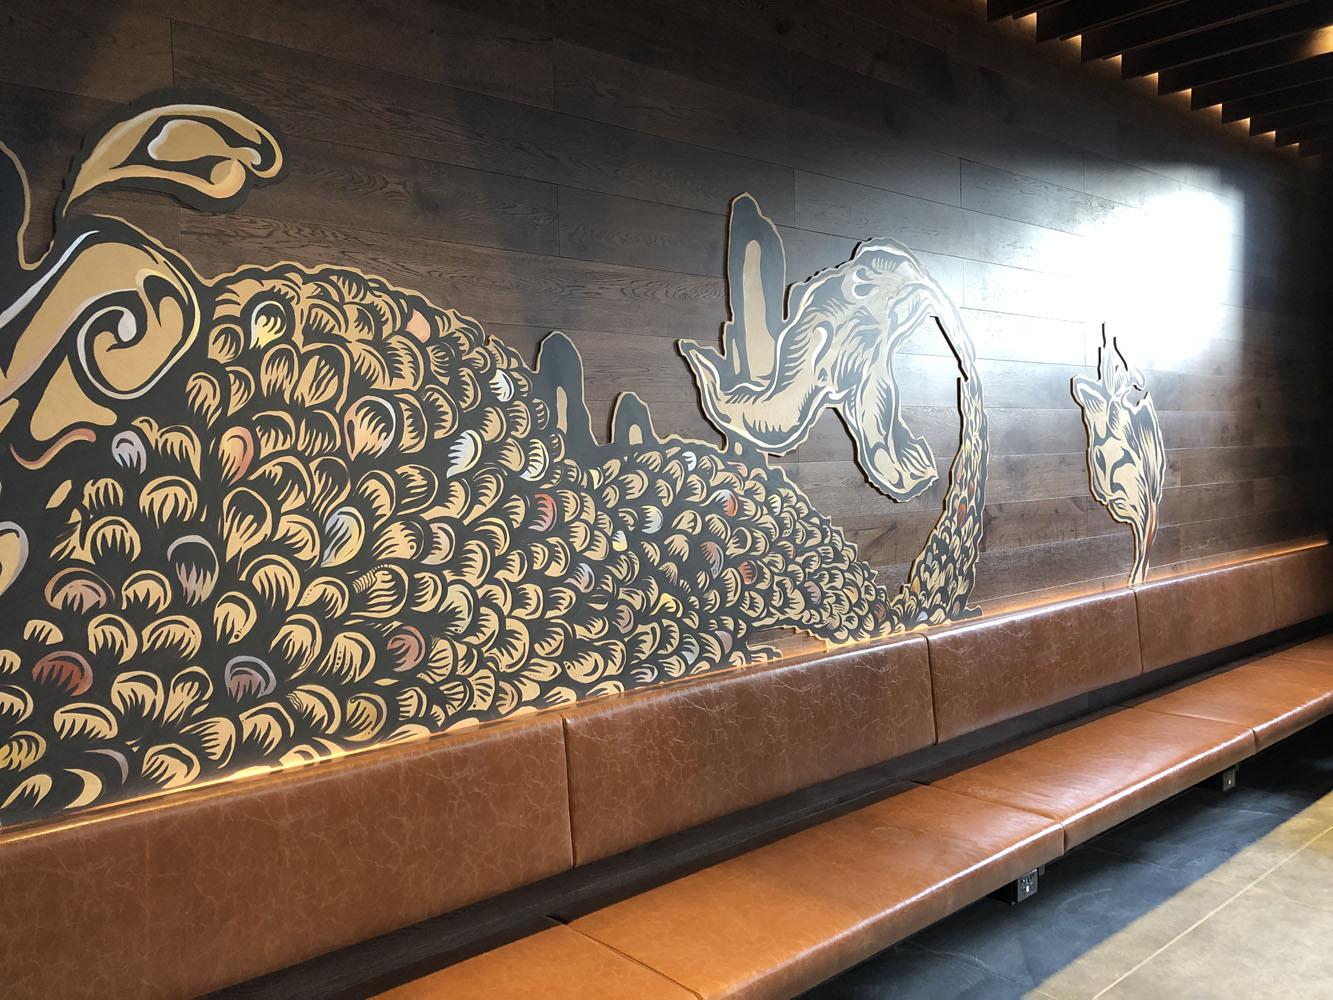 the-art-of-wall-starbucks-central-park-siren-tair-mermaid-wall-art-mural-2